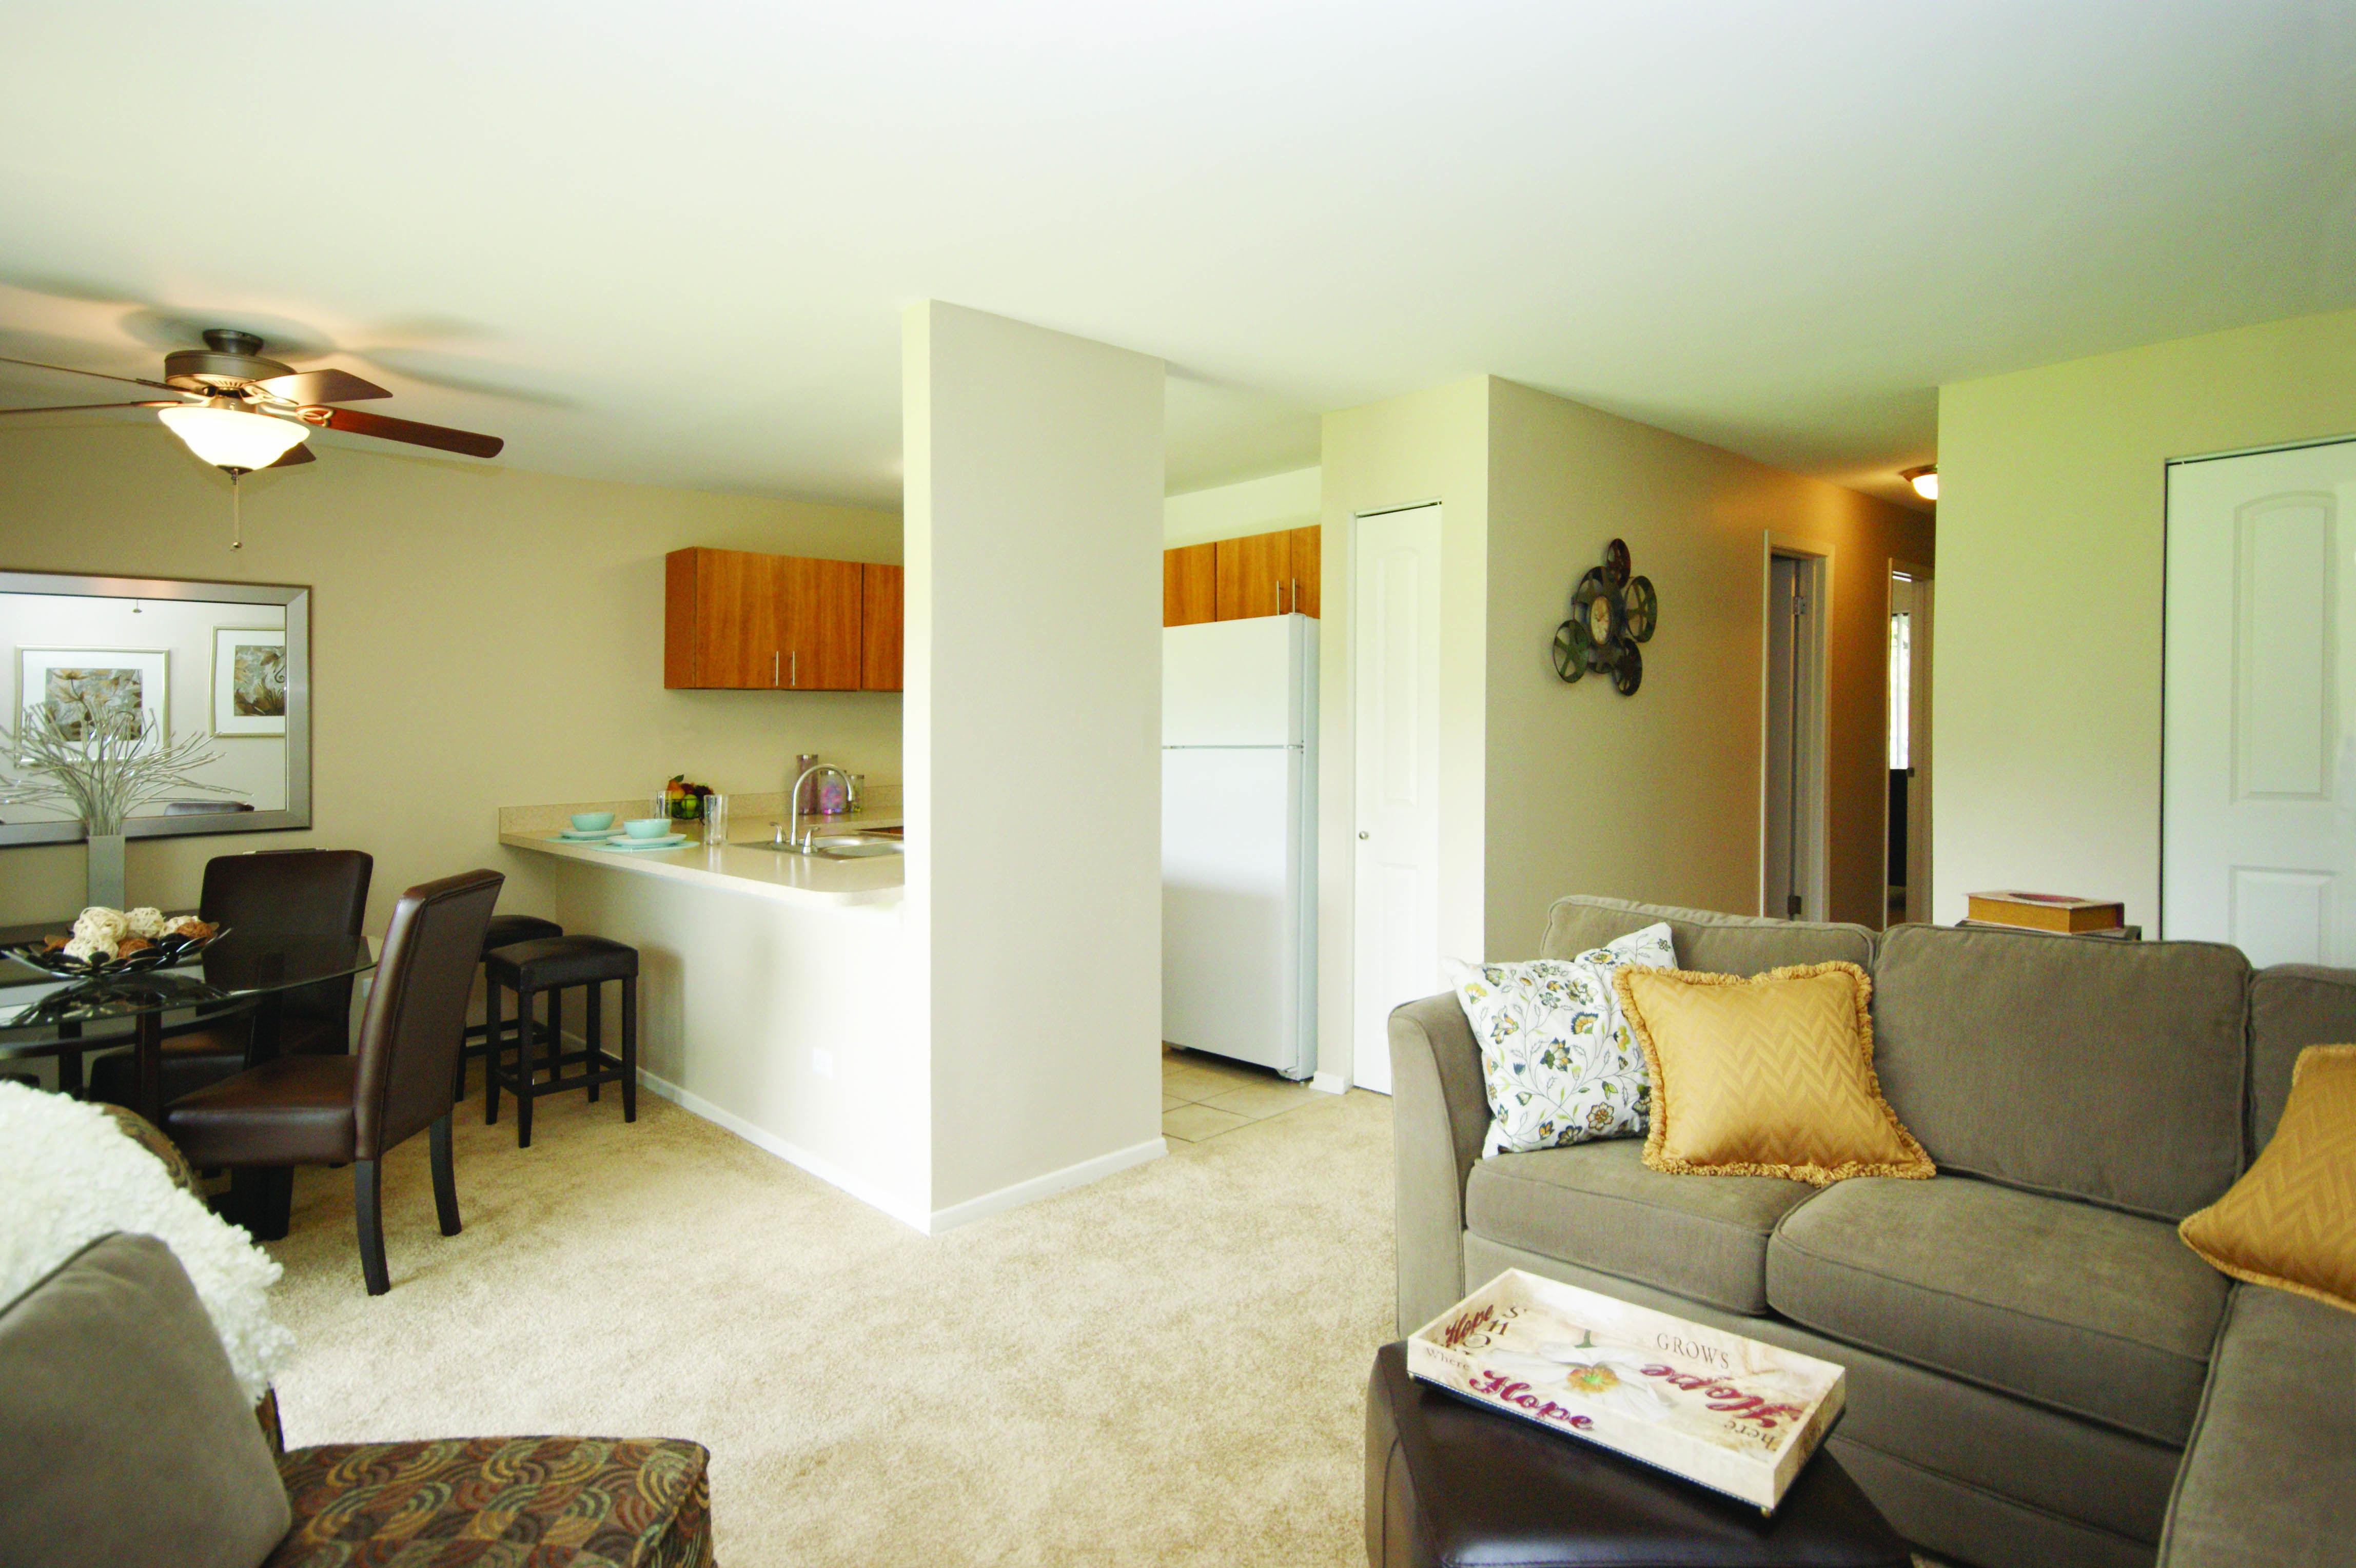 331 425 6522 1 2 Bedroom 1 2 Bath Addison Of Naperville 1598 Fairway Drive Naperville Il 60563 Naperville Home Apartments For Rent